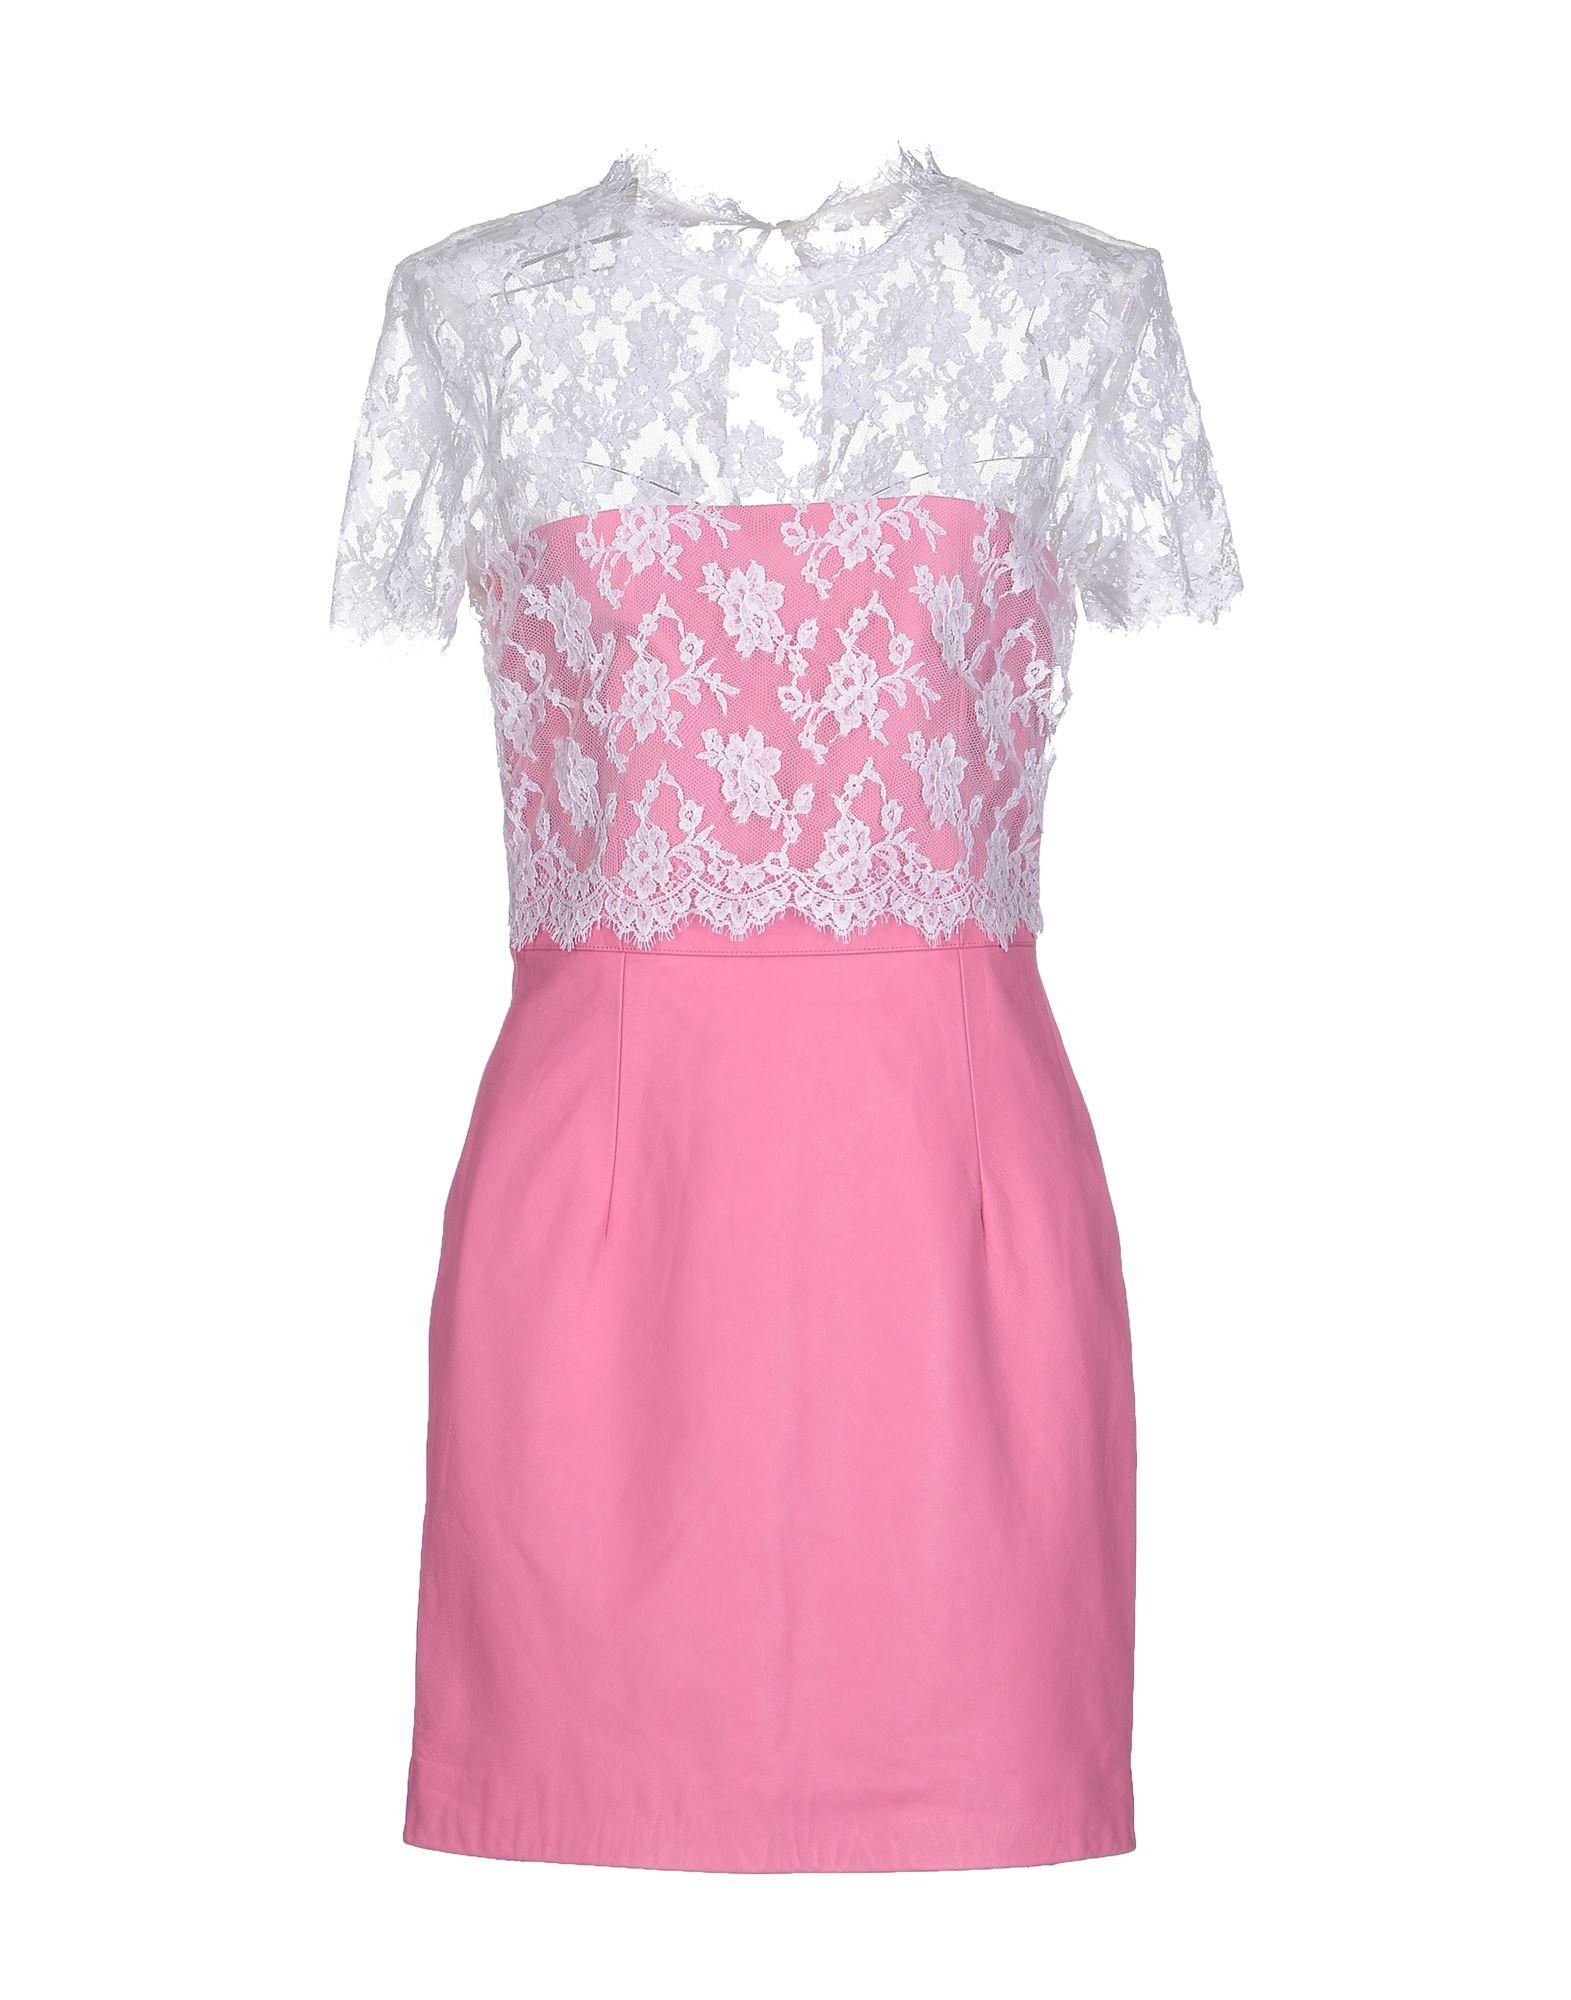 Lyst valentino short dress in pink for Valentino short wedding dress